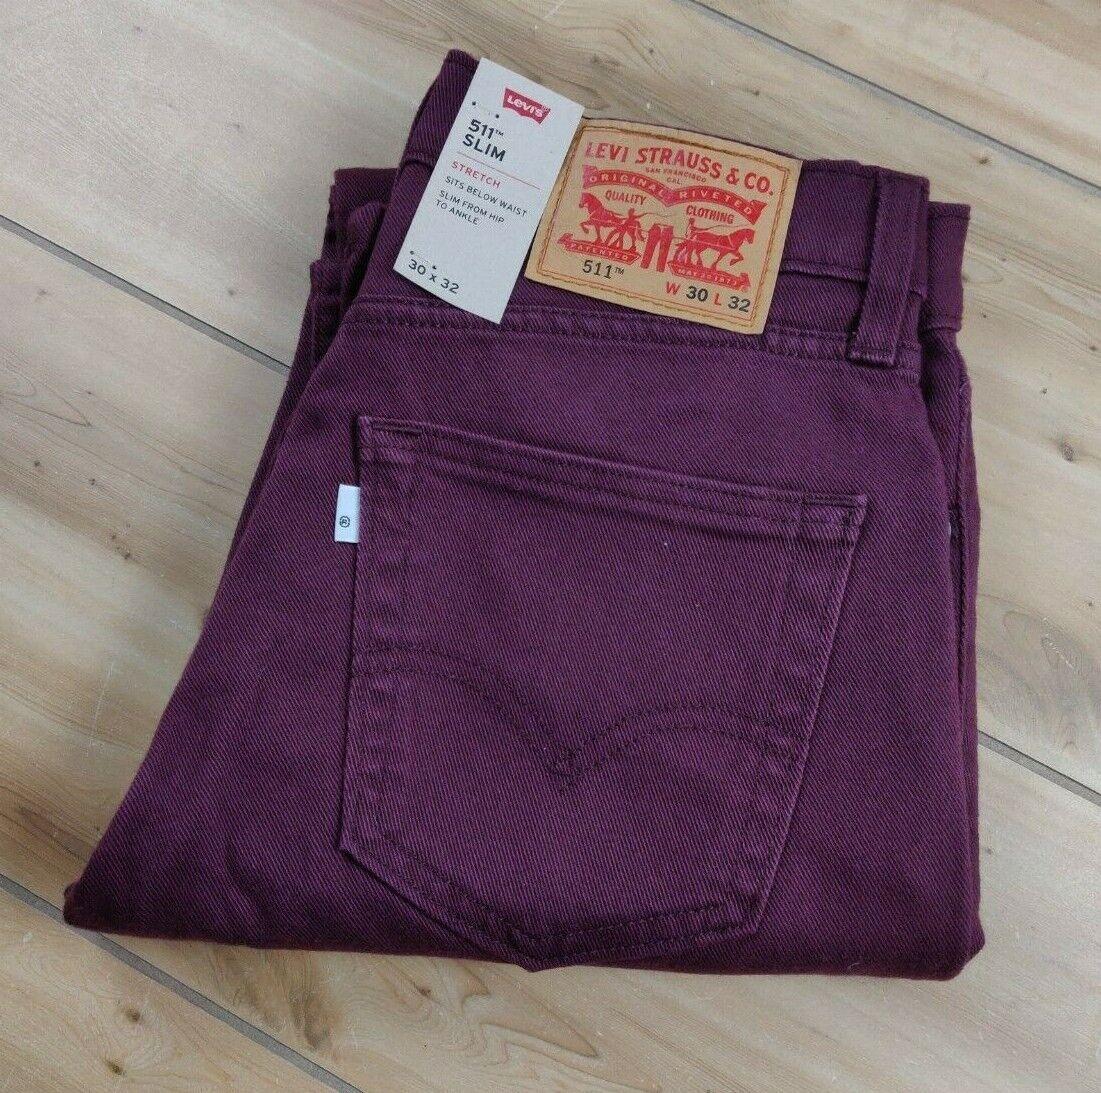 New Levis 511 Slim Fit Tencel Burgundy Stretch Jeans Mens Size 30x32 Wine - $39.95